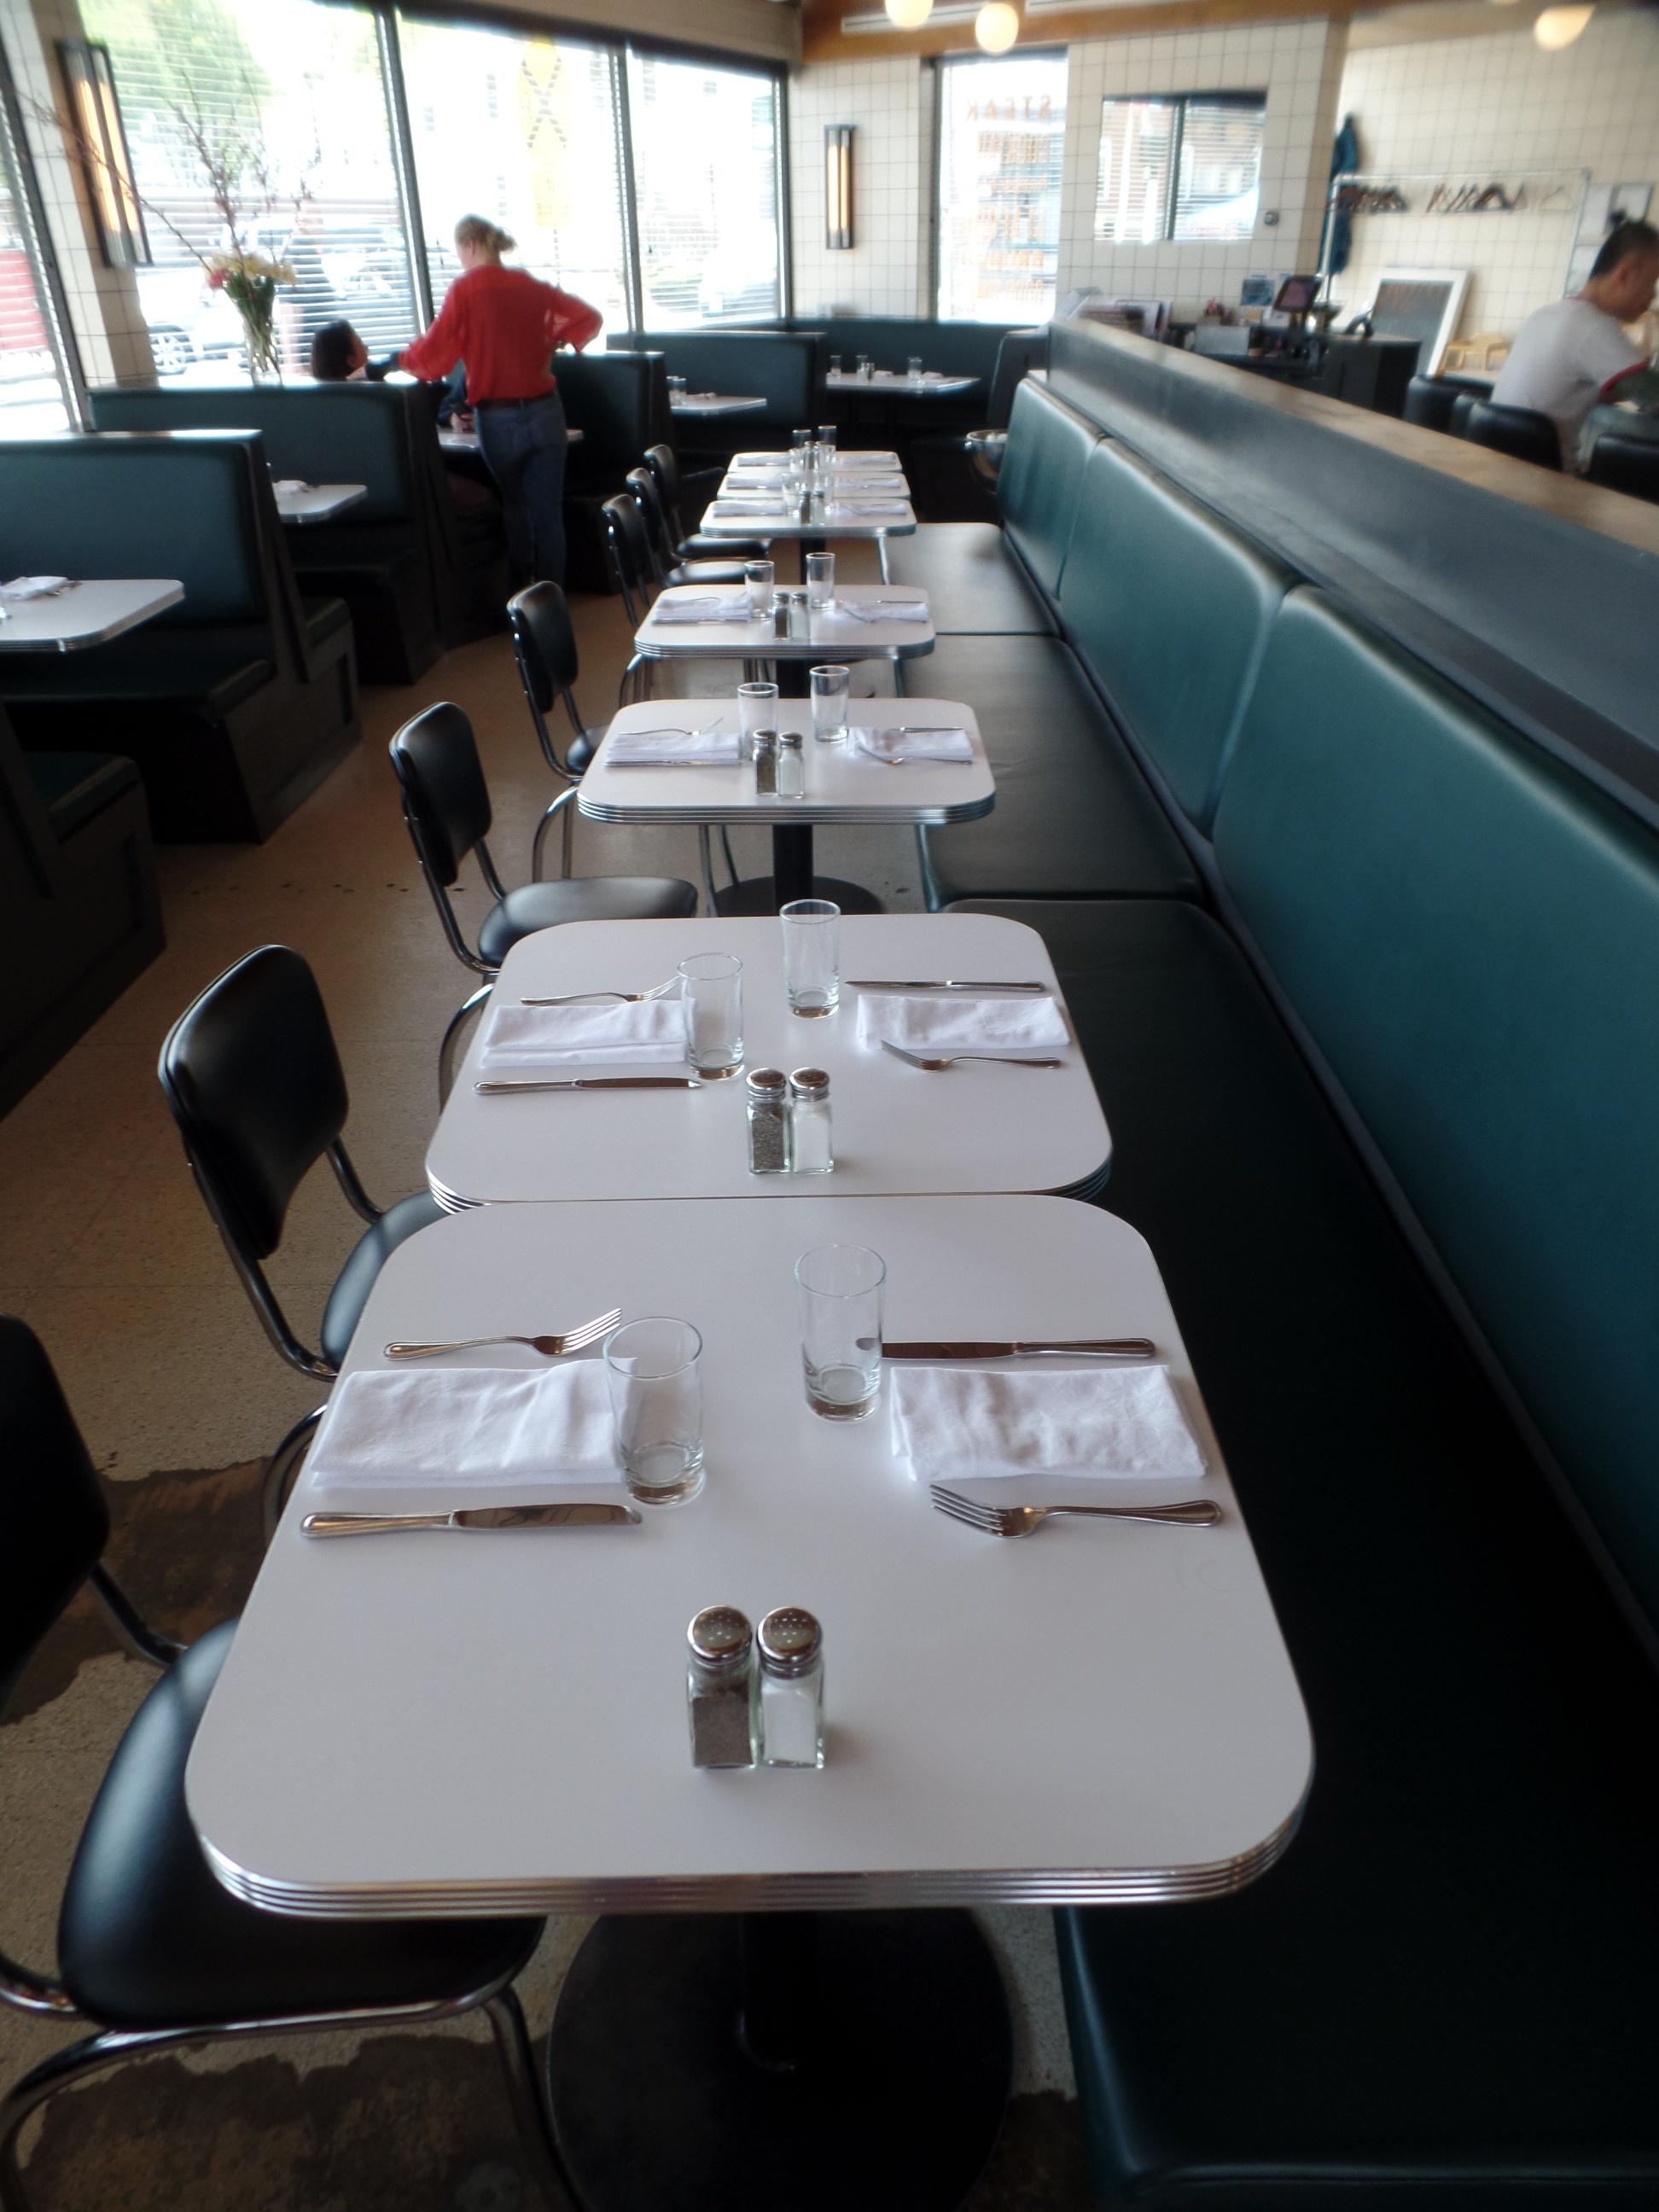 Woodfords_F&B_seating_Interior_2017.JPG